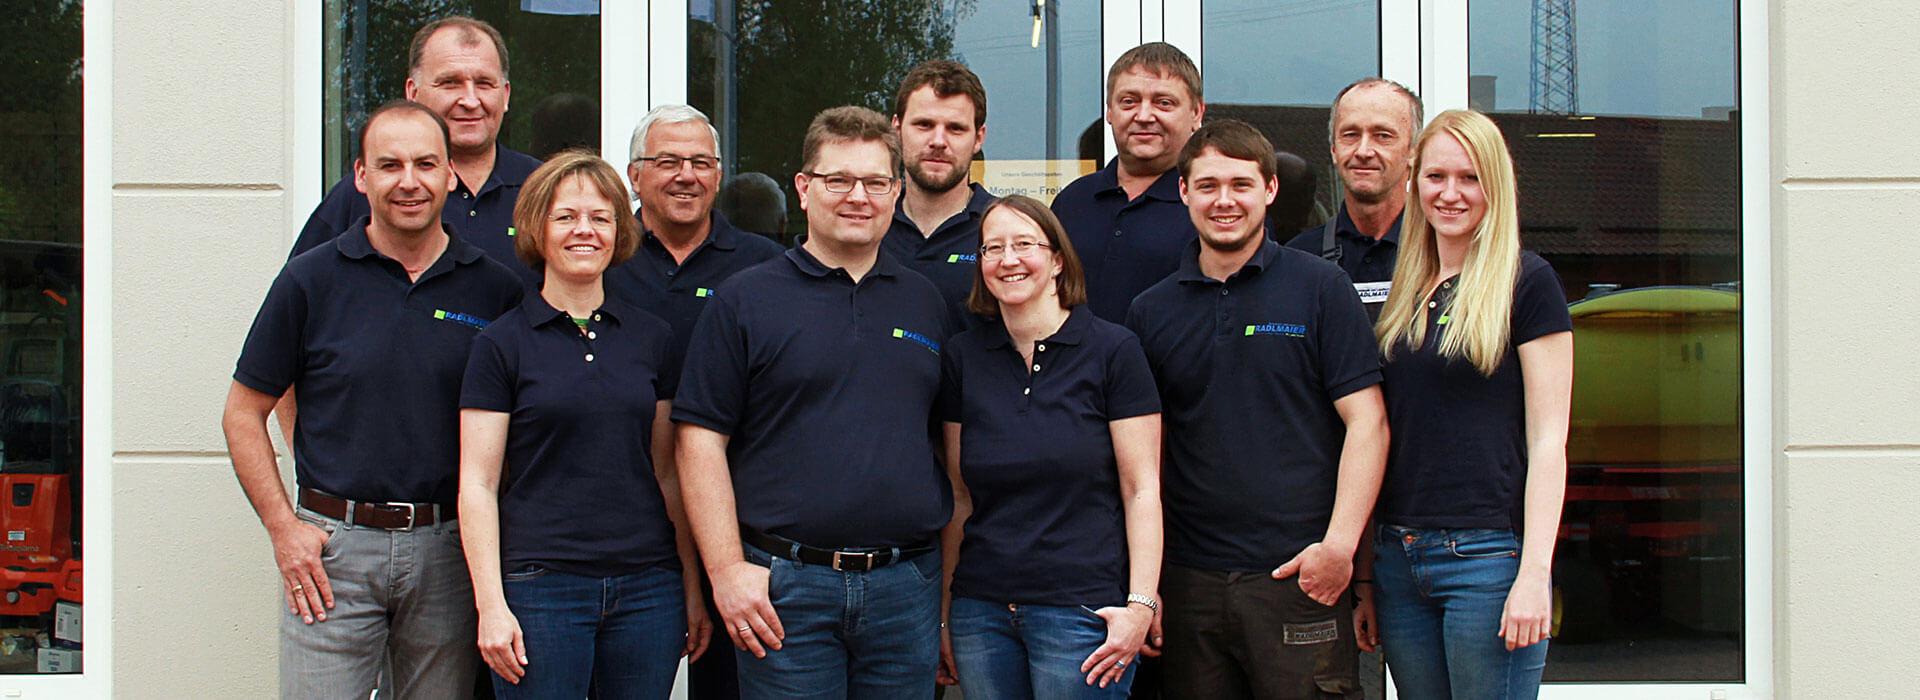 Radlmaier Team